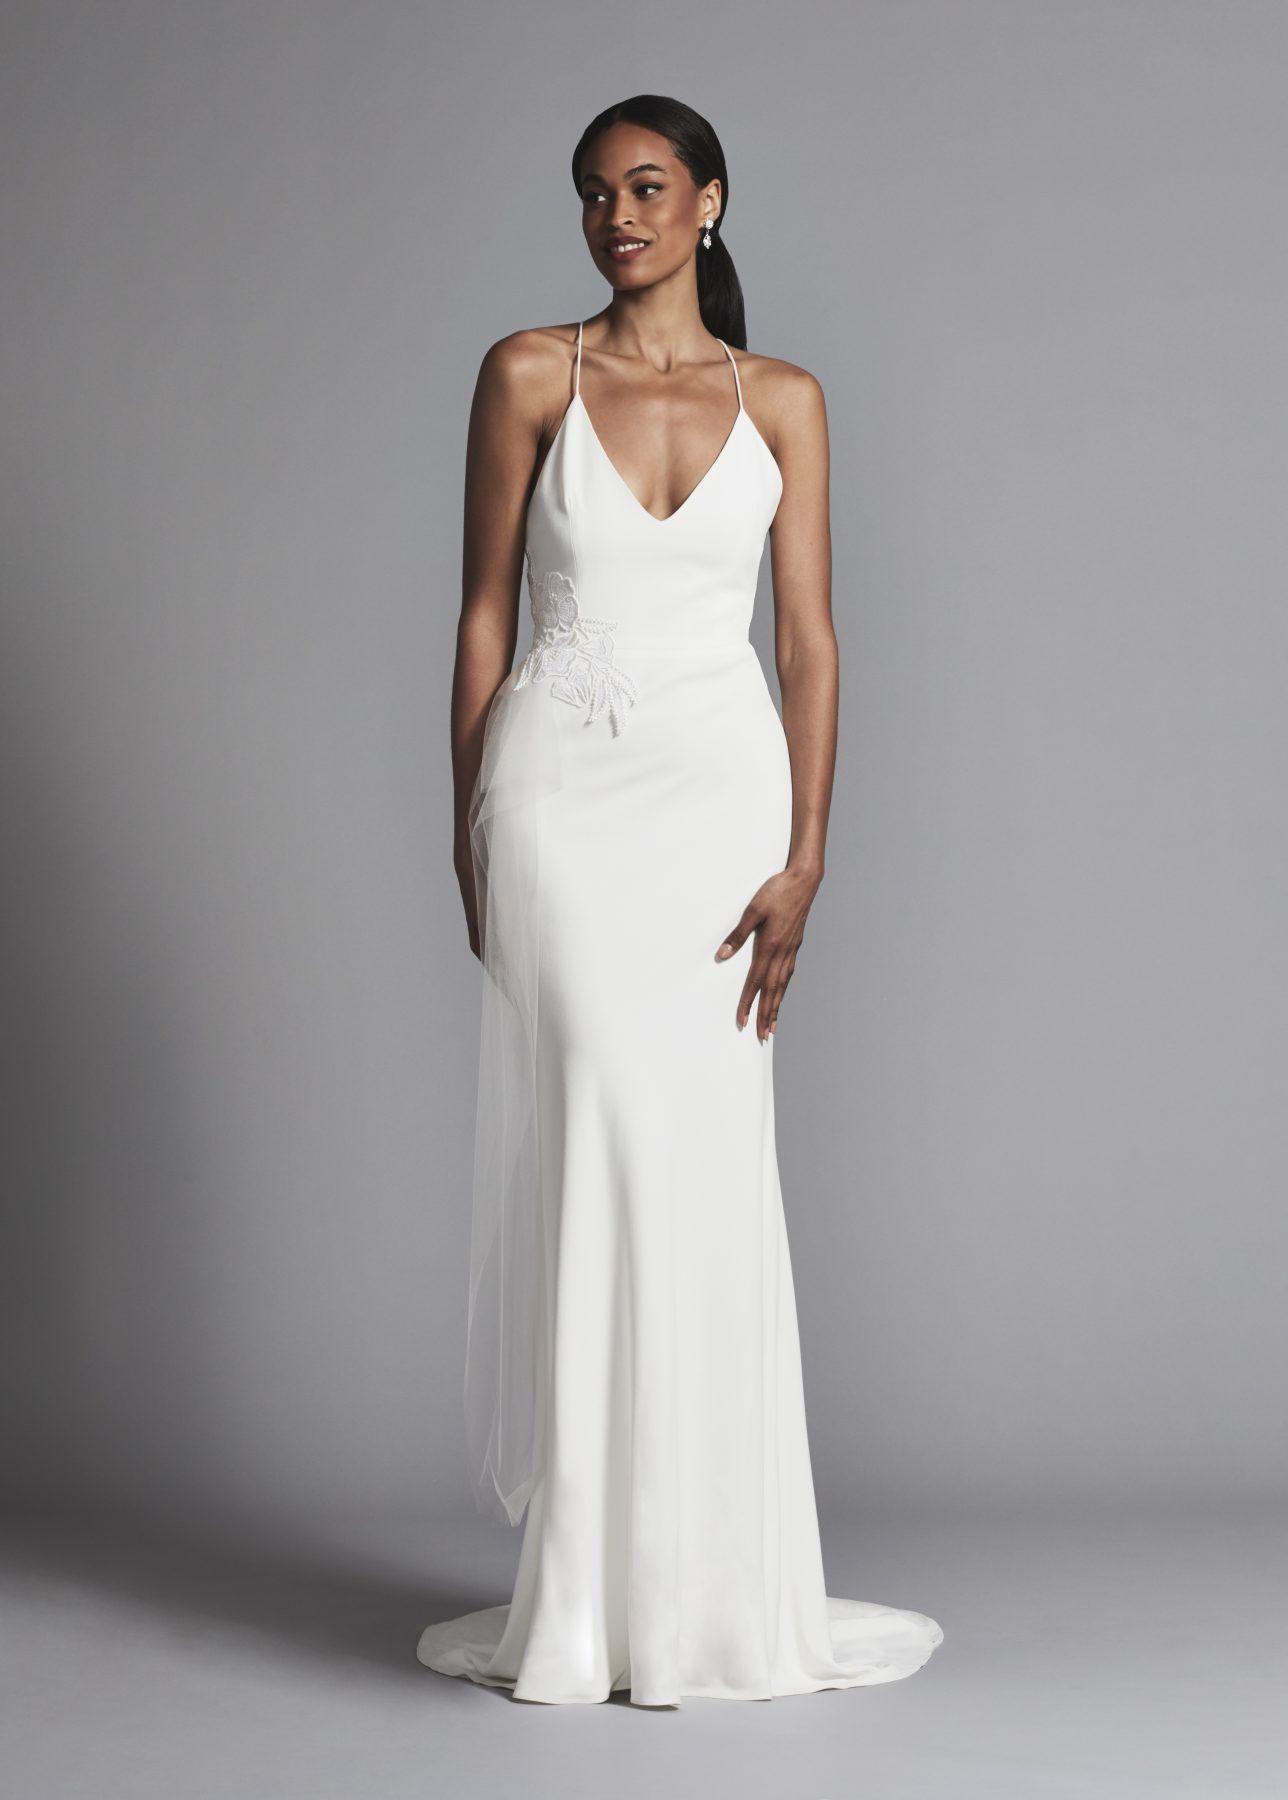 Simple Sheath Spaghetti Strap Crepe Wedding Dress With V Neckline Elizabeth Fillmore Style Theanew Wedding Dresses Kleinfeld Dresses Summer Wedding Dress